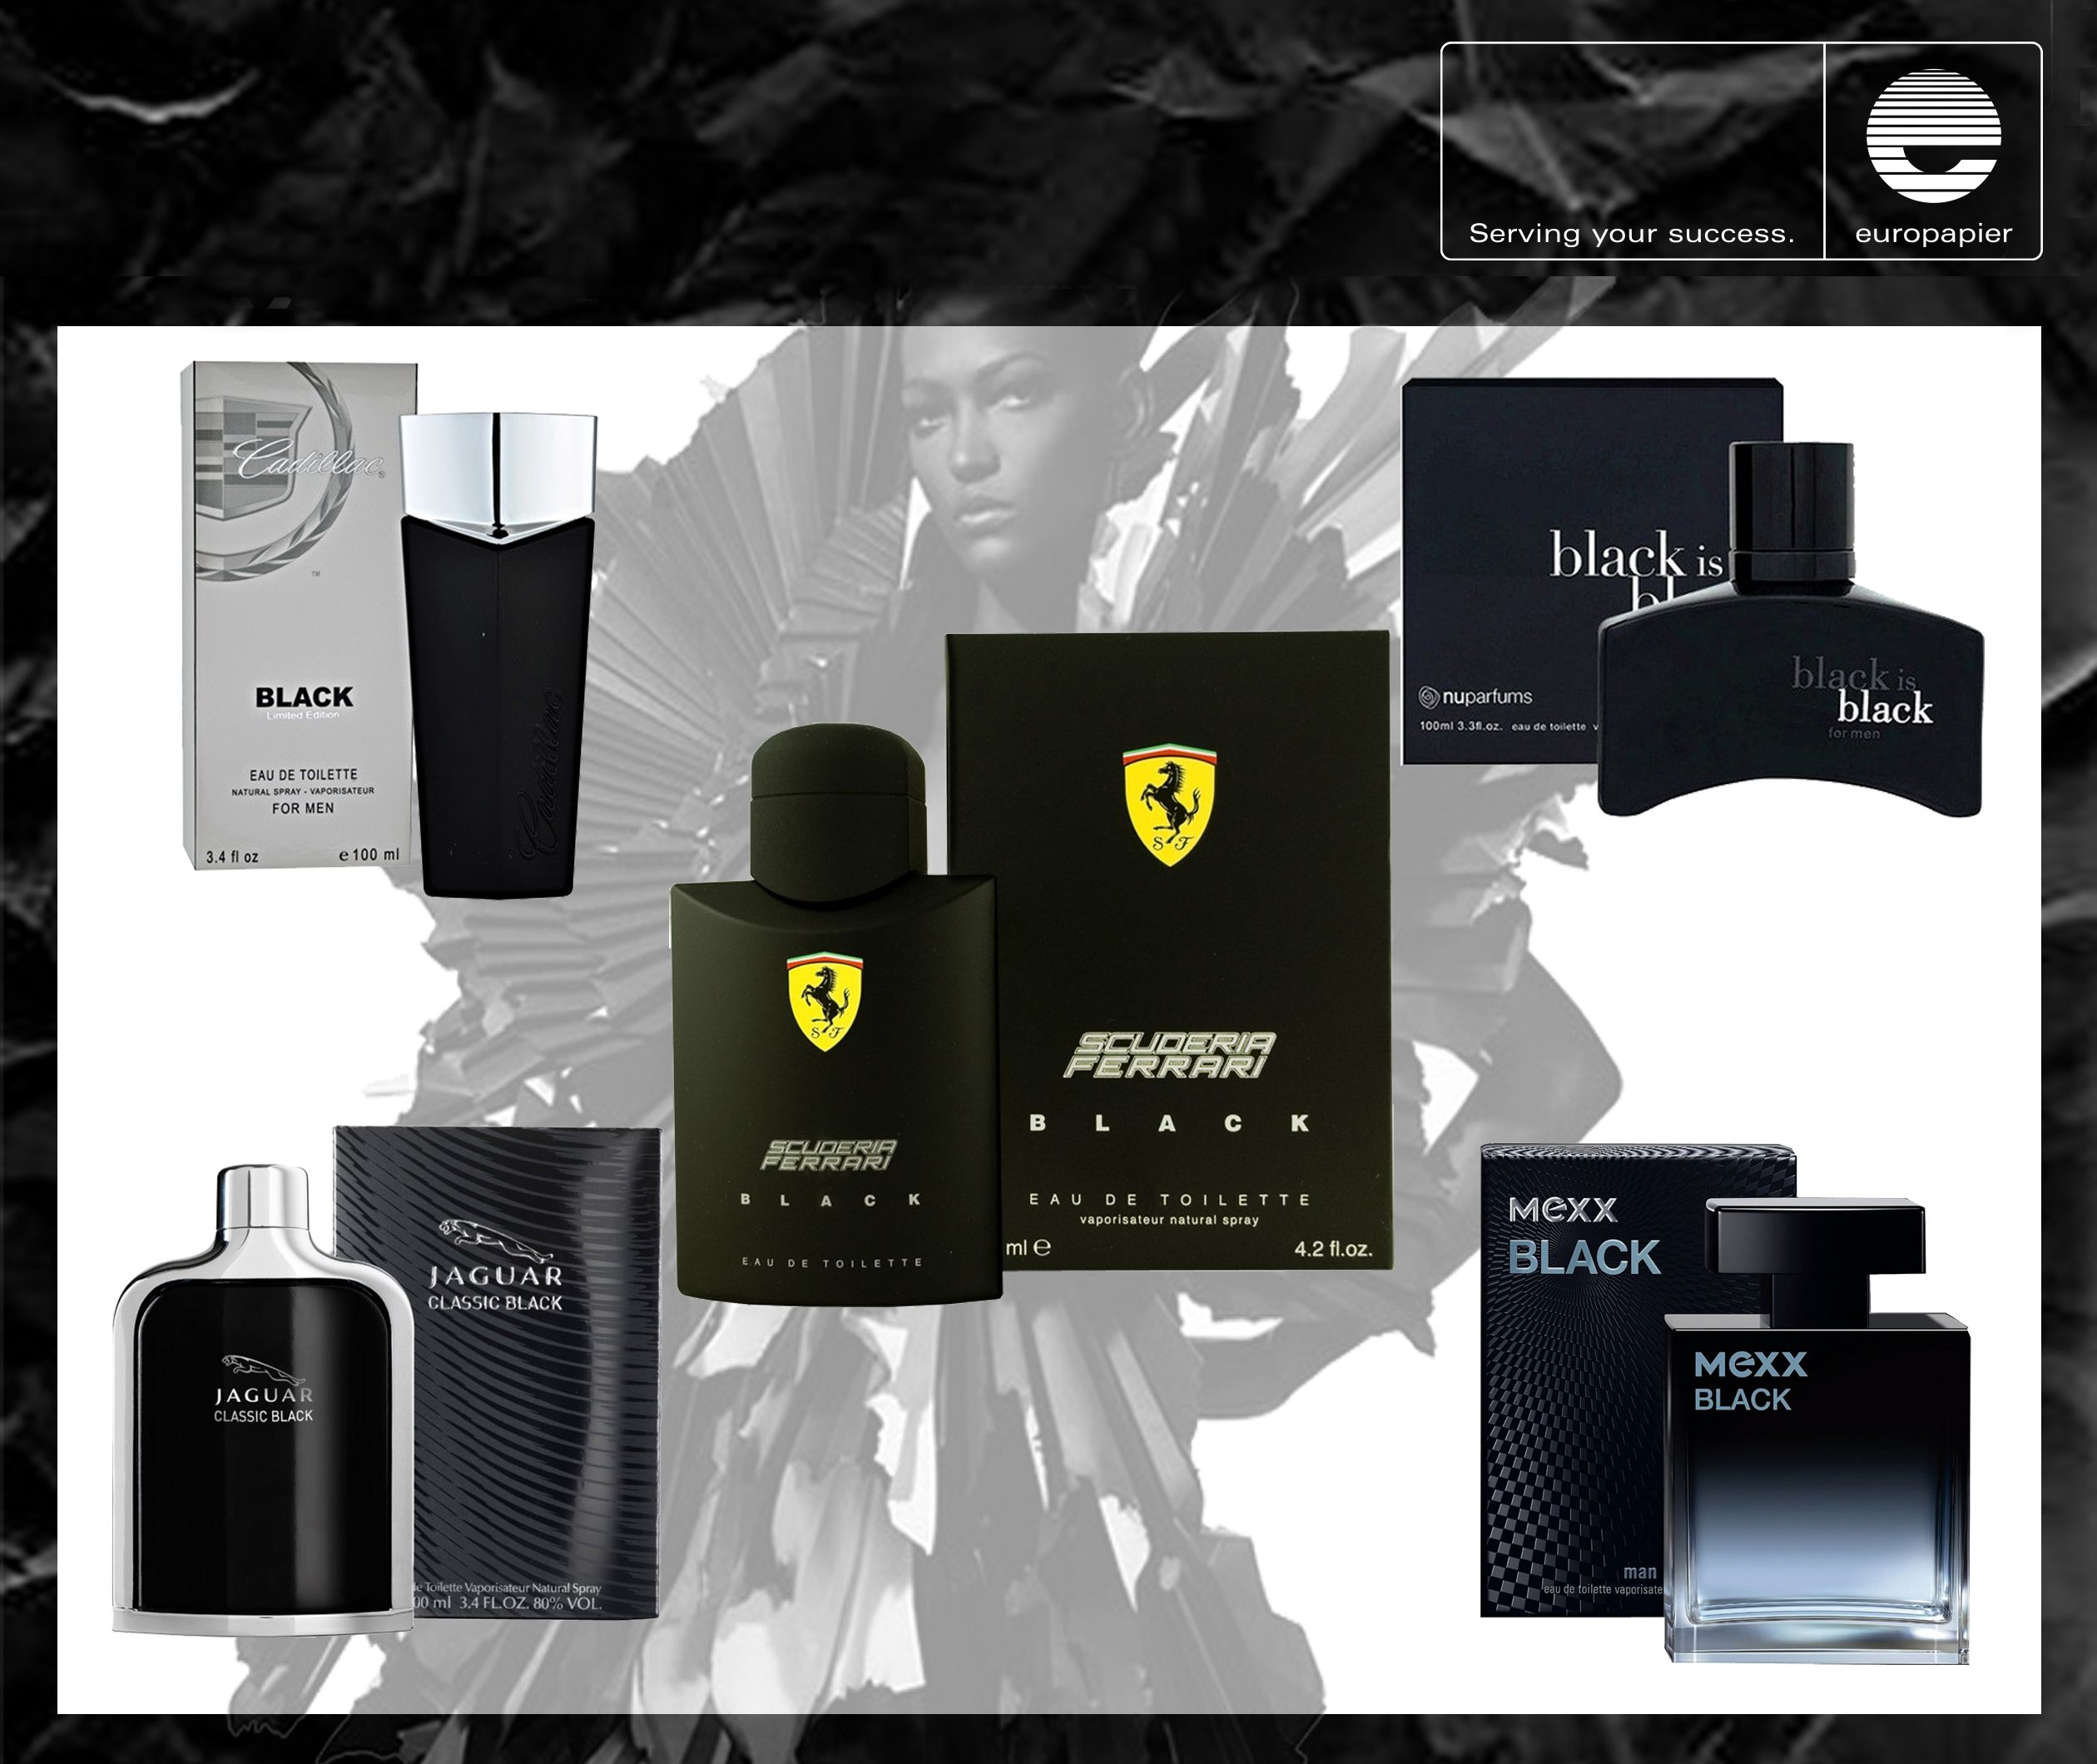 Voňavé potešenie s BLACK-om! - http://detepe.sk/vonave-potesenie-s-black-om/